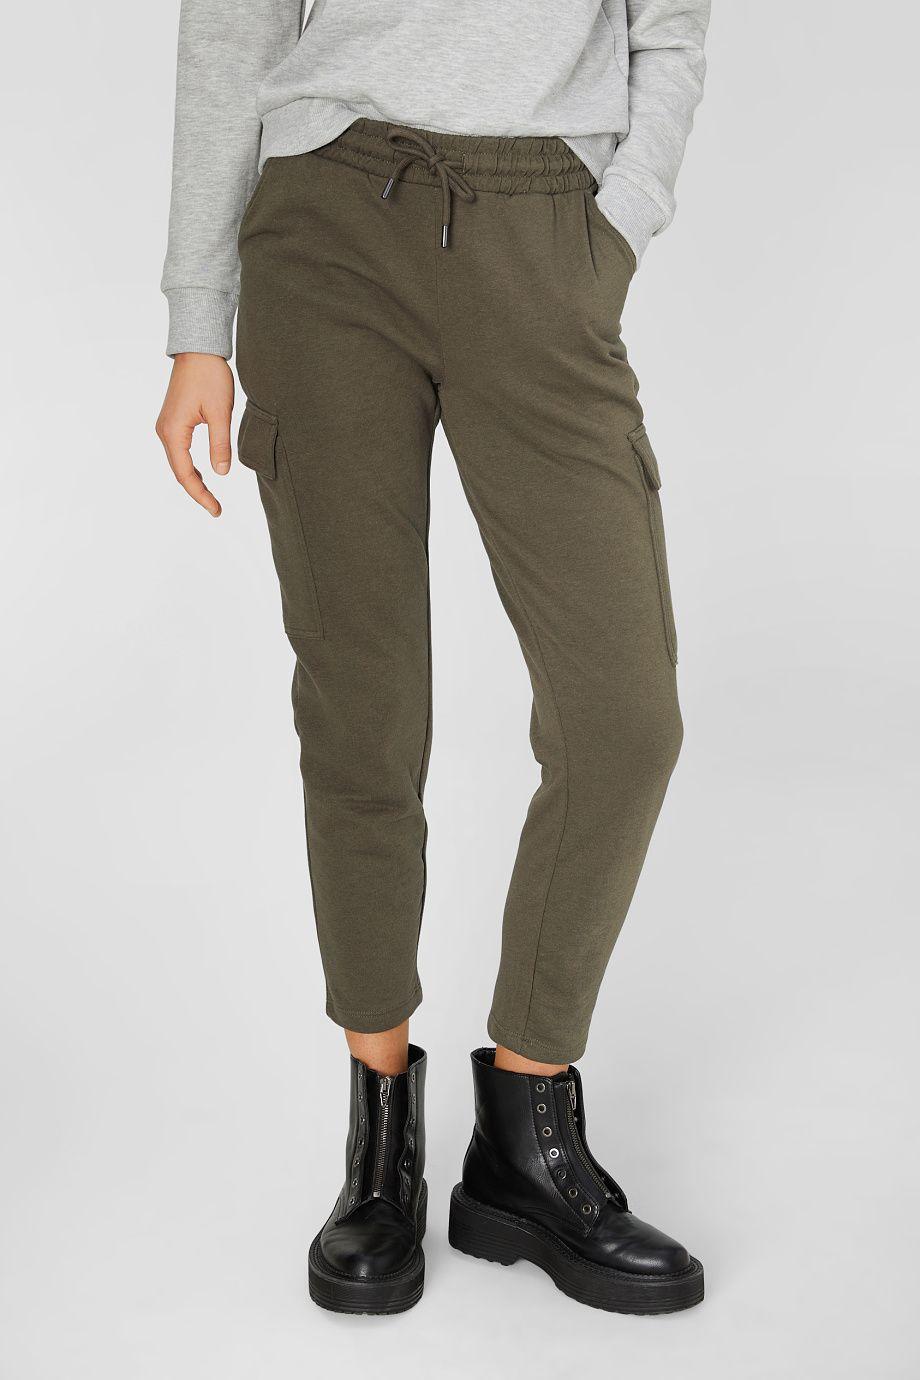 Cargo Trousers In 2020 Cargo Trousers Sweatshirt Fabric Comfy Fashion